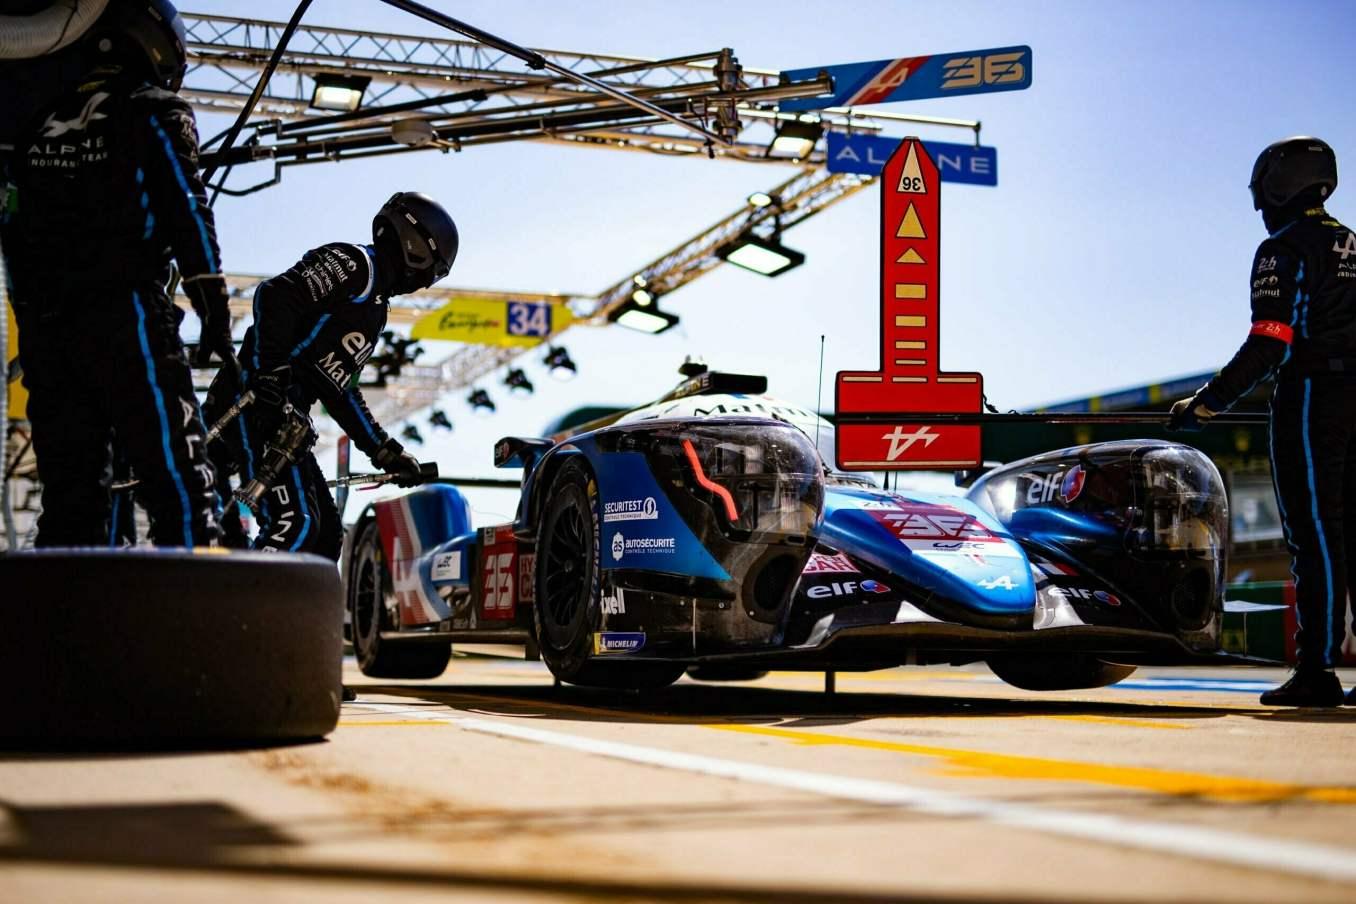 Alpine Endurance Team A480 24 Heures du Mans 2021 3 scaled | Les 24h du mans d'Alpine Endurance Team en photos